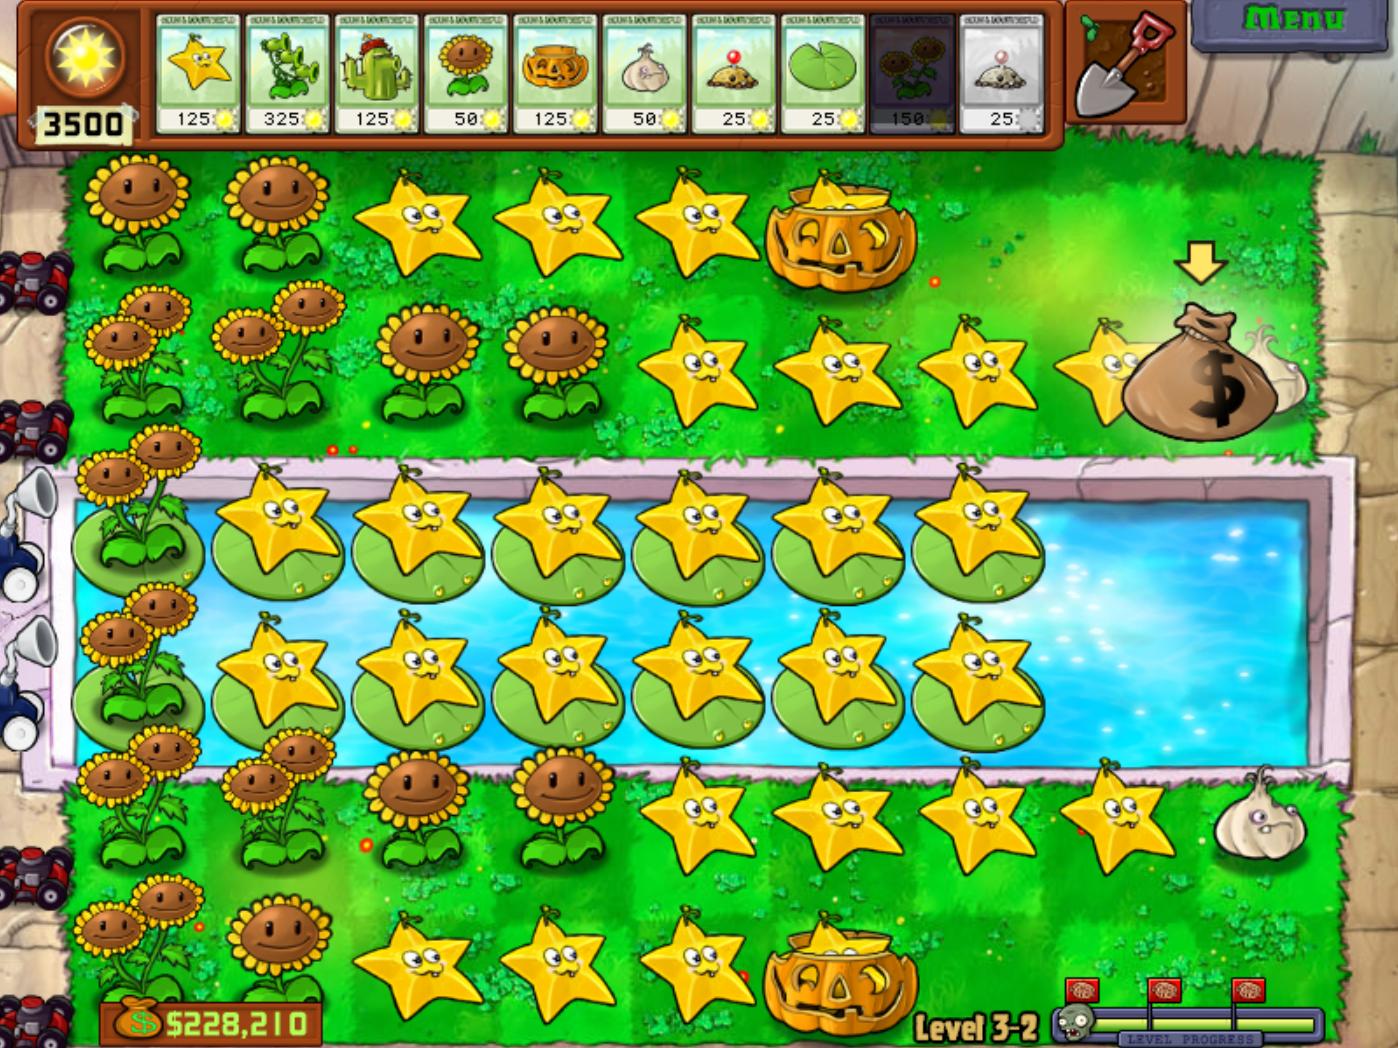 Fruit vs zombies - Starfruit